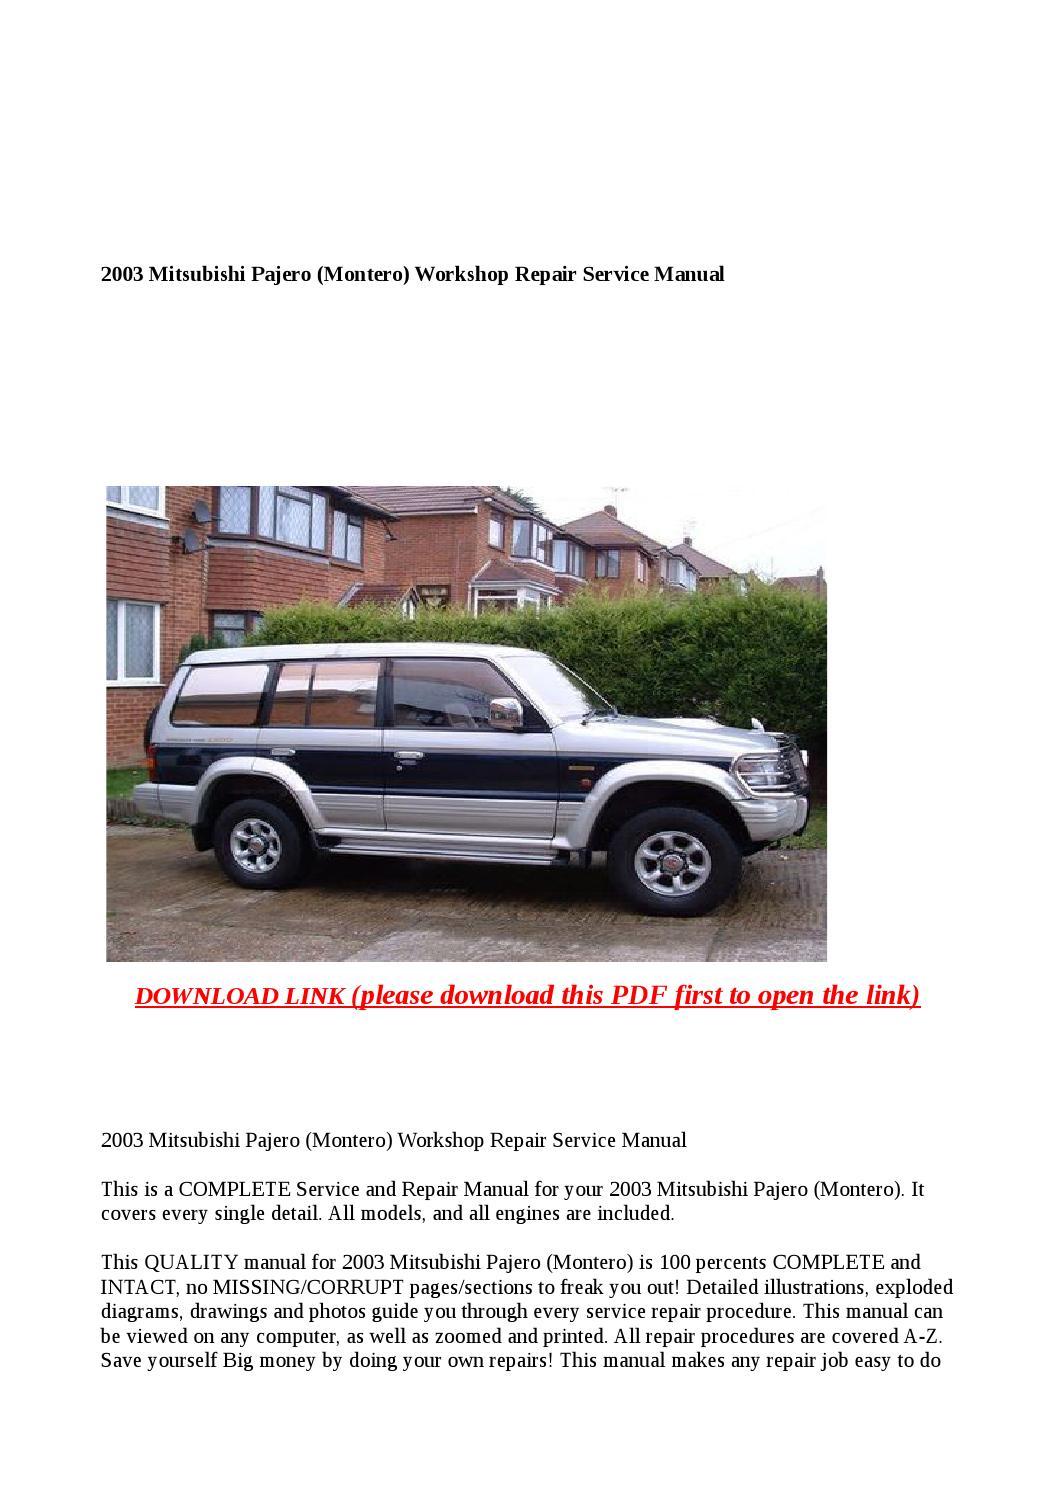 2003 Mitsubishi Pajero  Montero  Workshop Repair Service Manual By Steve